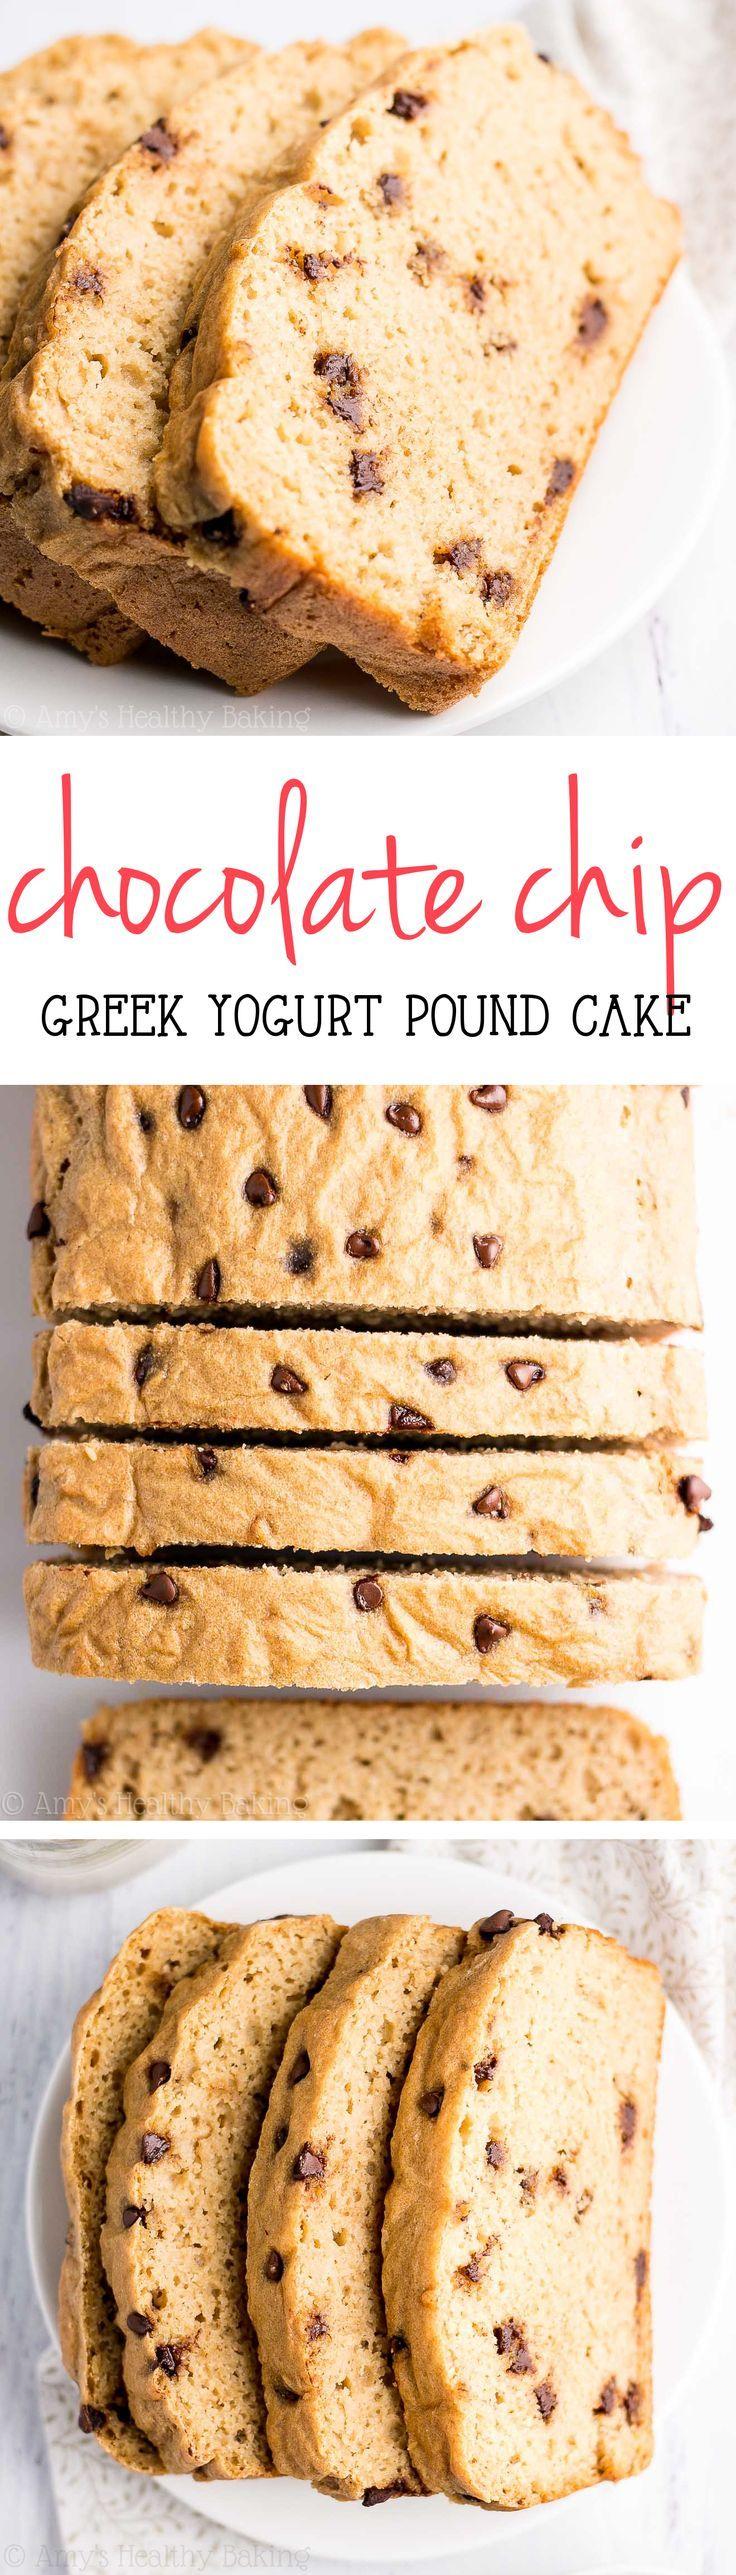 Best 25+ Chocolate chip pound cake ideas on Pinterest | Chocolate ...